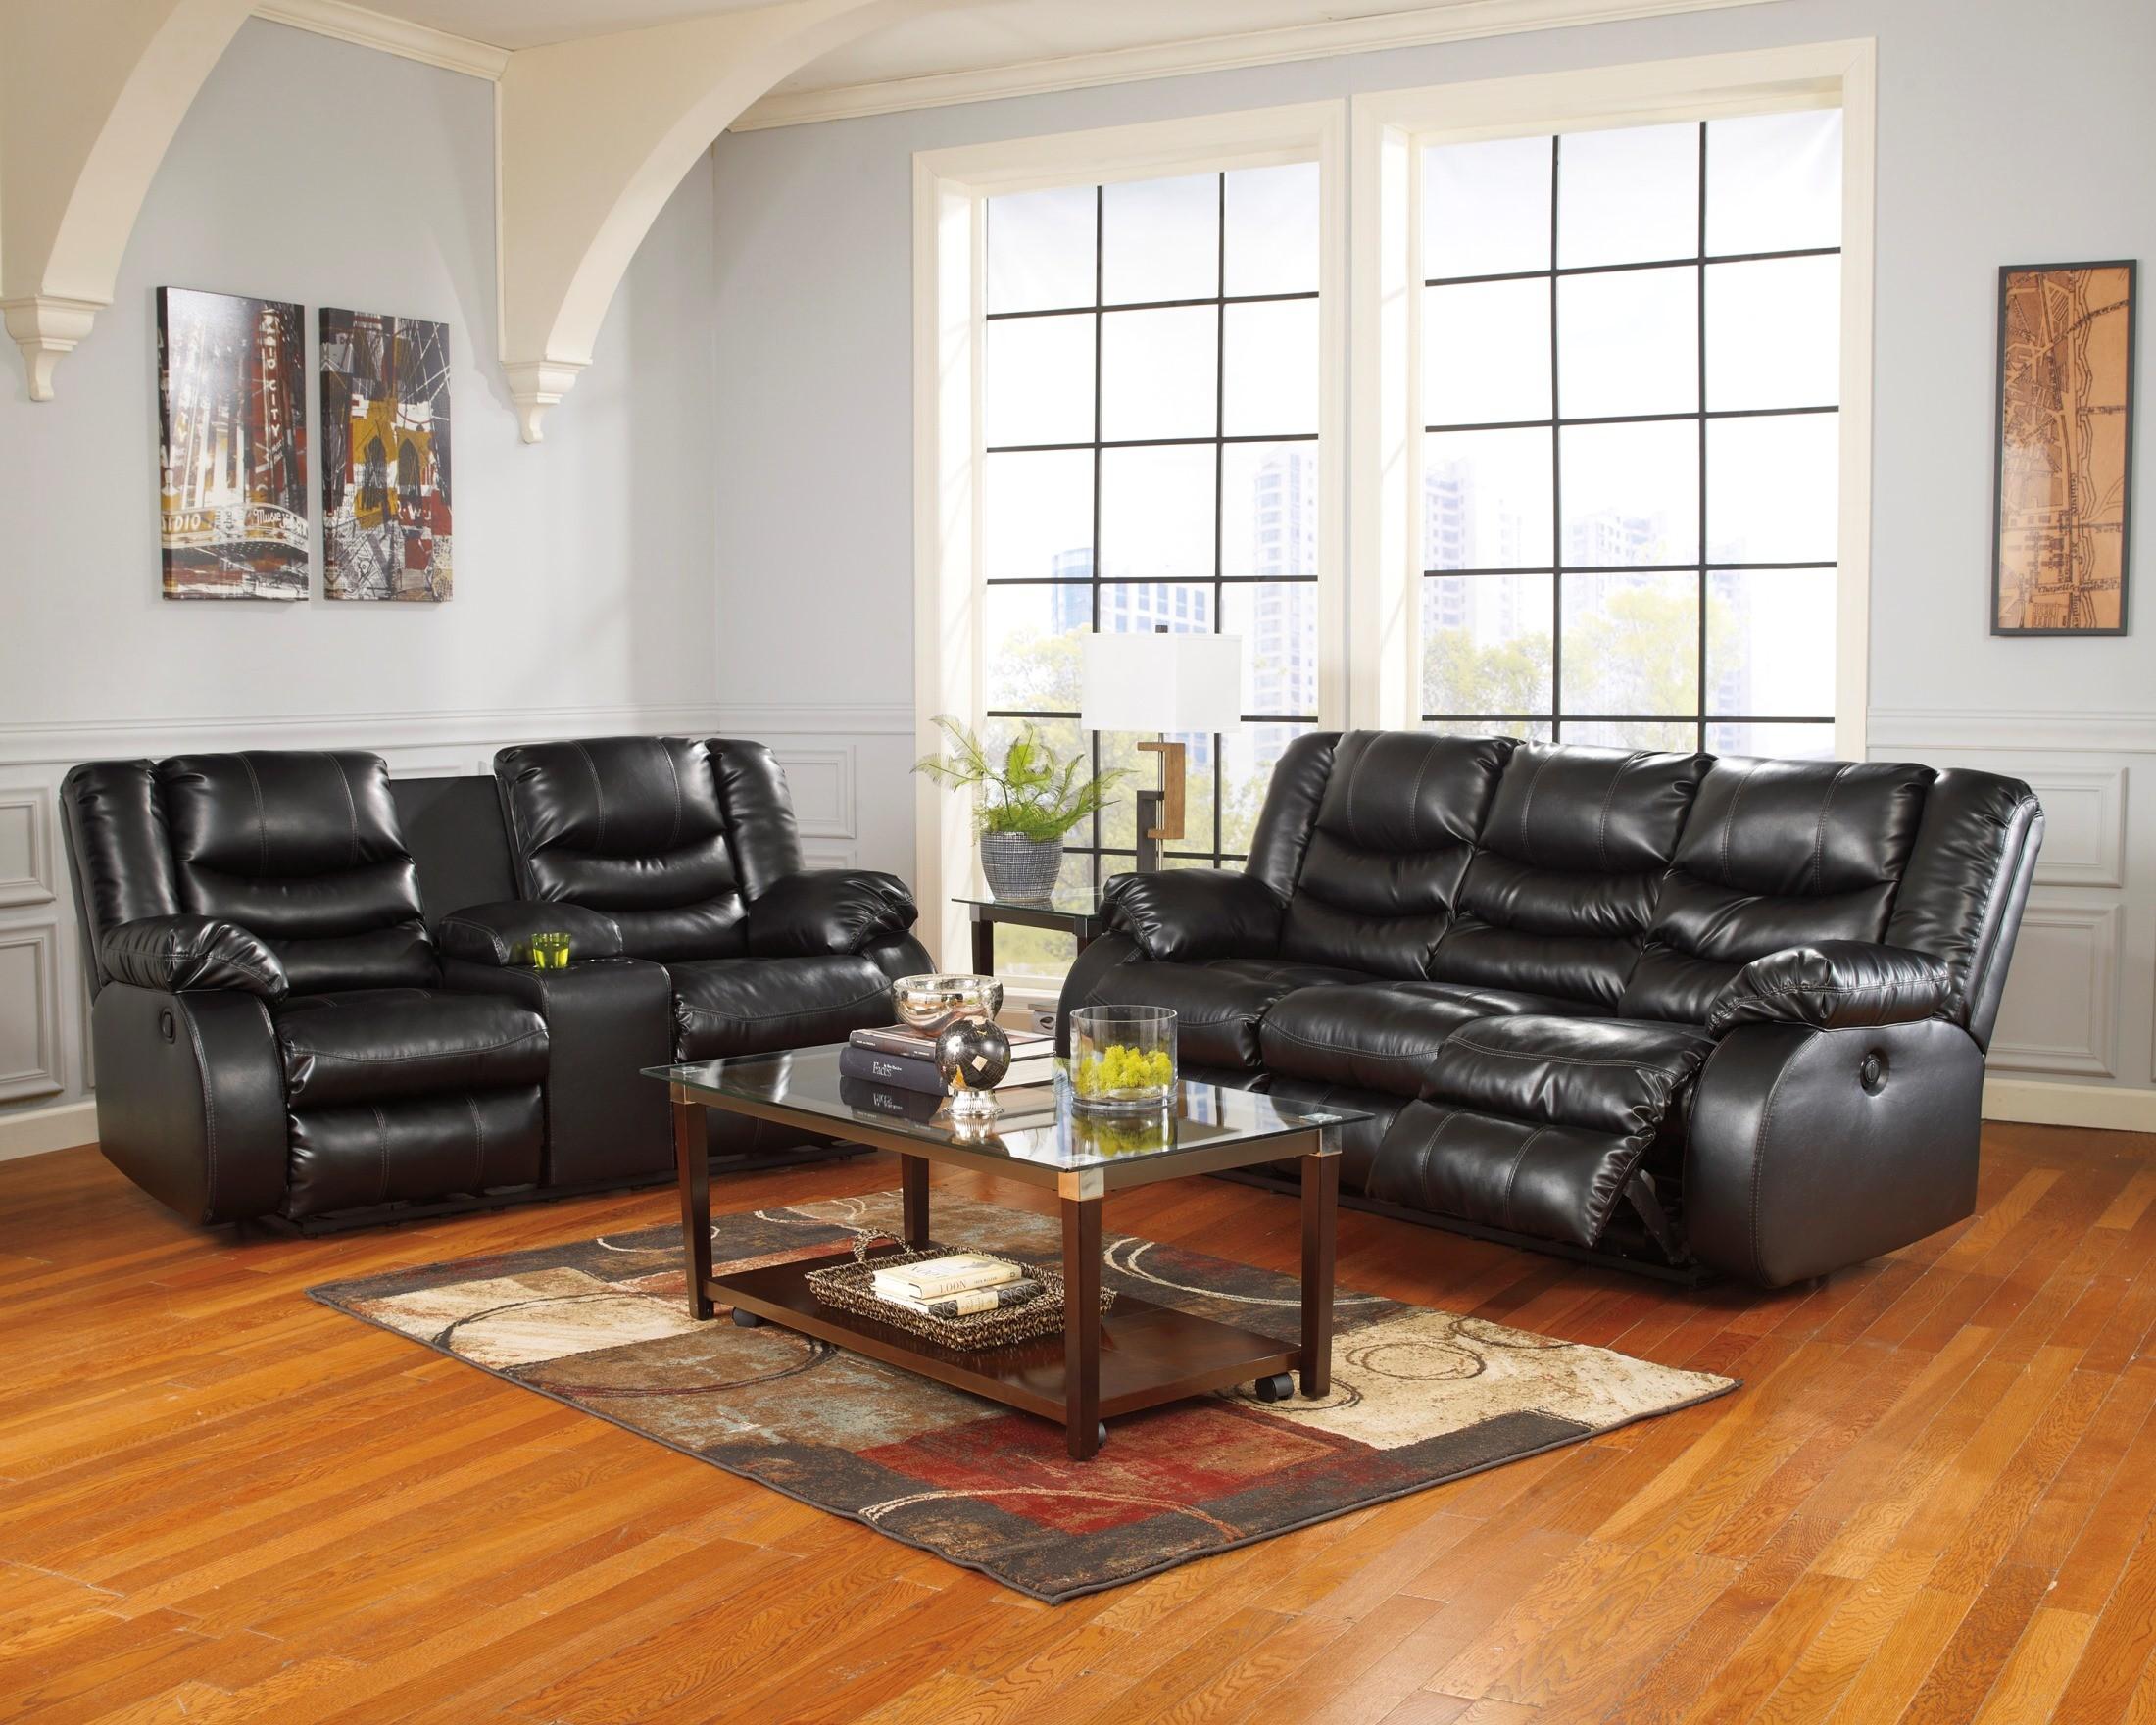 423249 & LineBacker DuraBlend Black Reclining Living Room Set from Ashley ... islam-shia.org